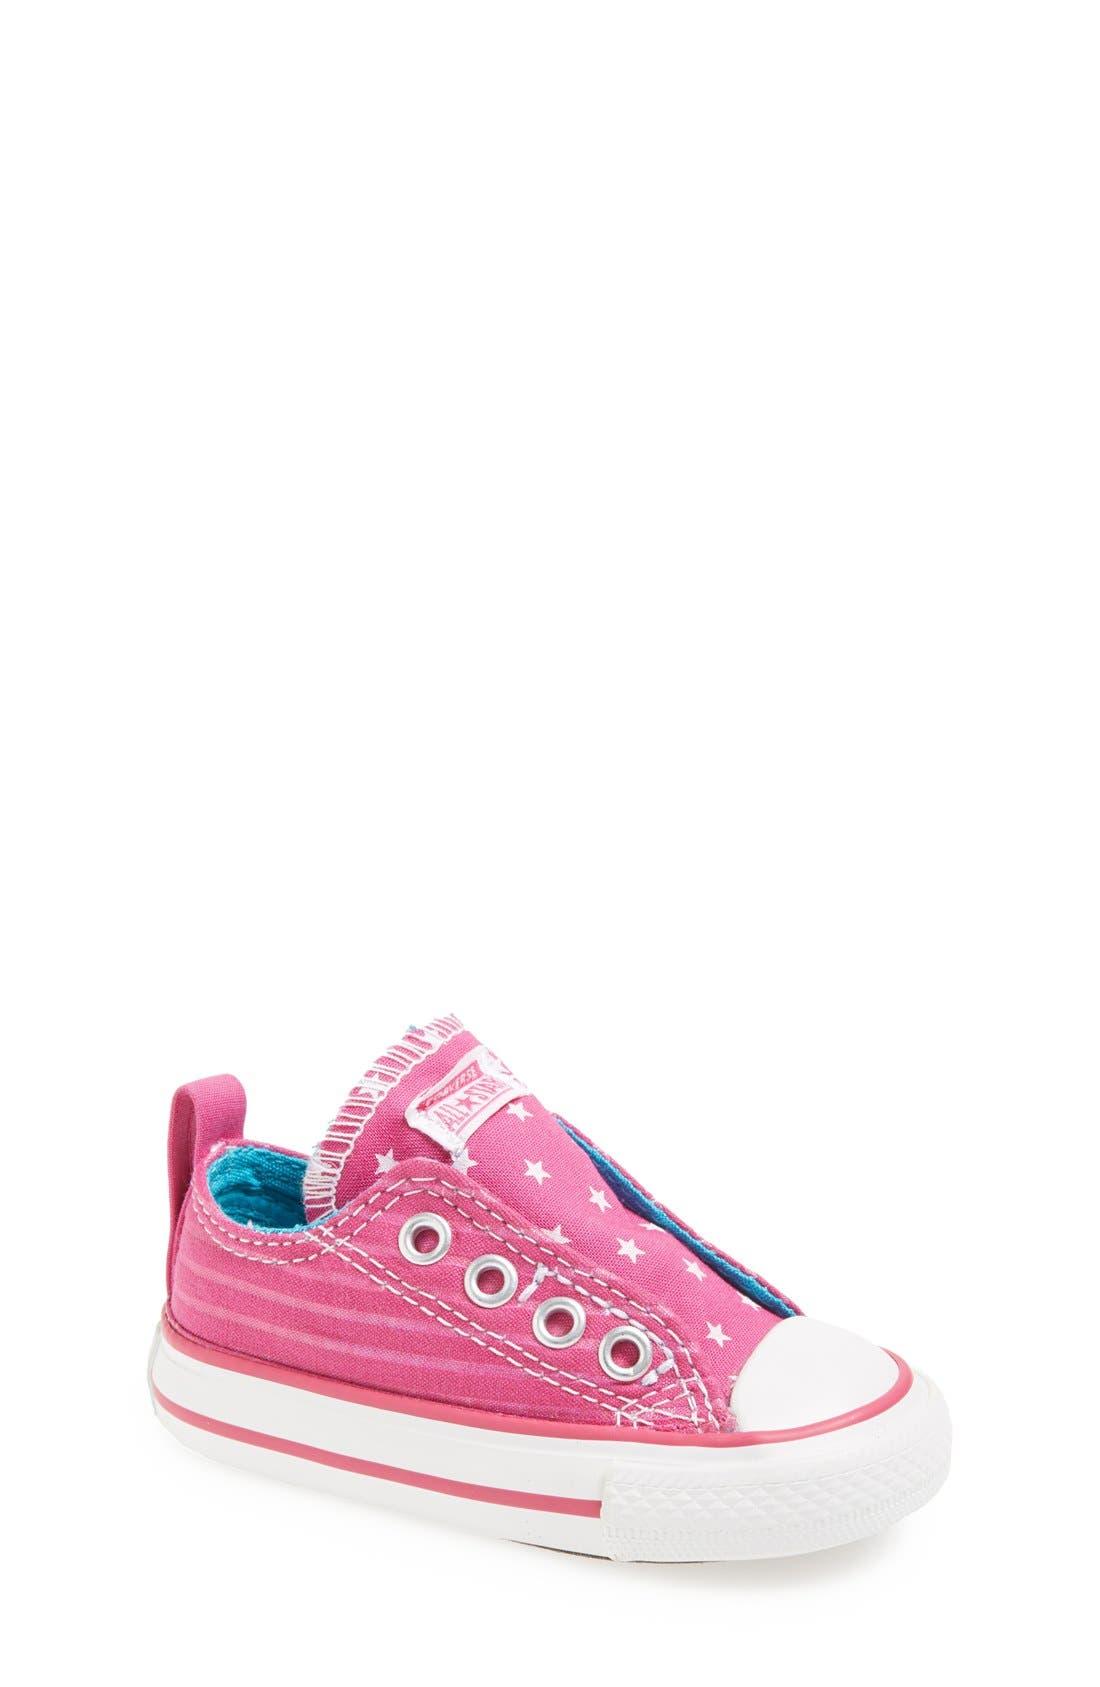 Main Image - Converse All Star® Slip-On Sneaker (Baby, Walker & Toddler)